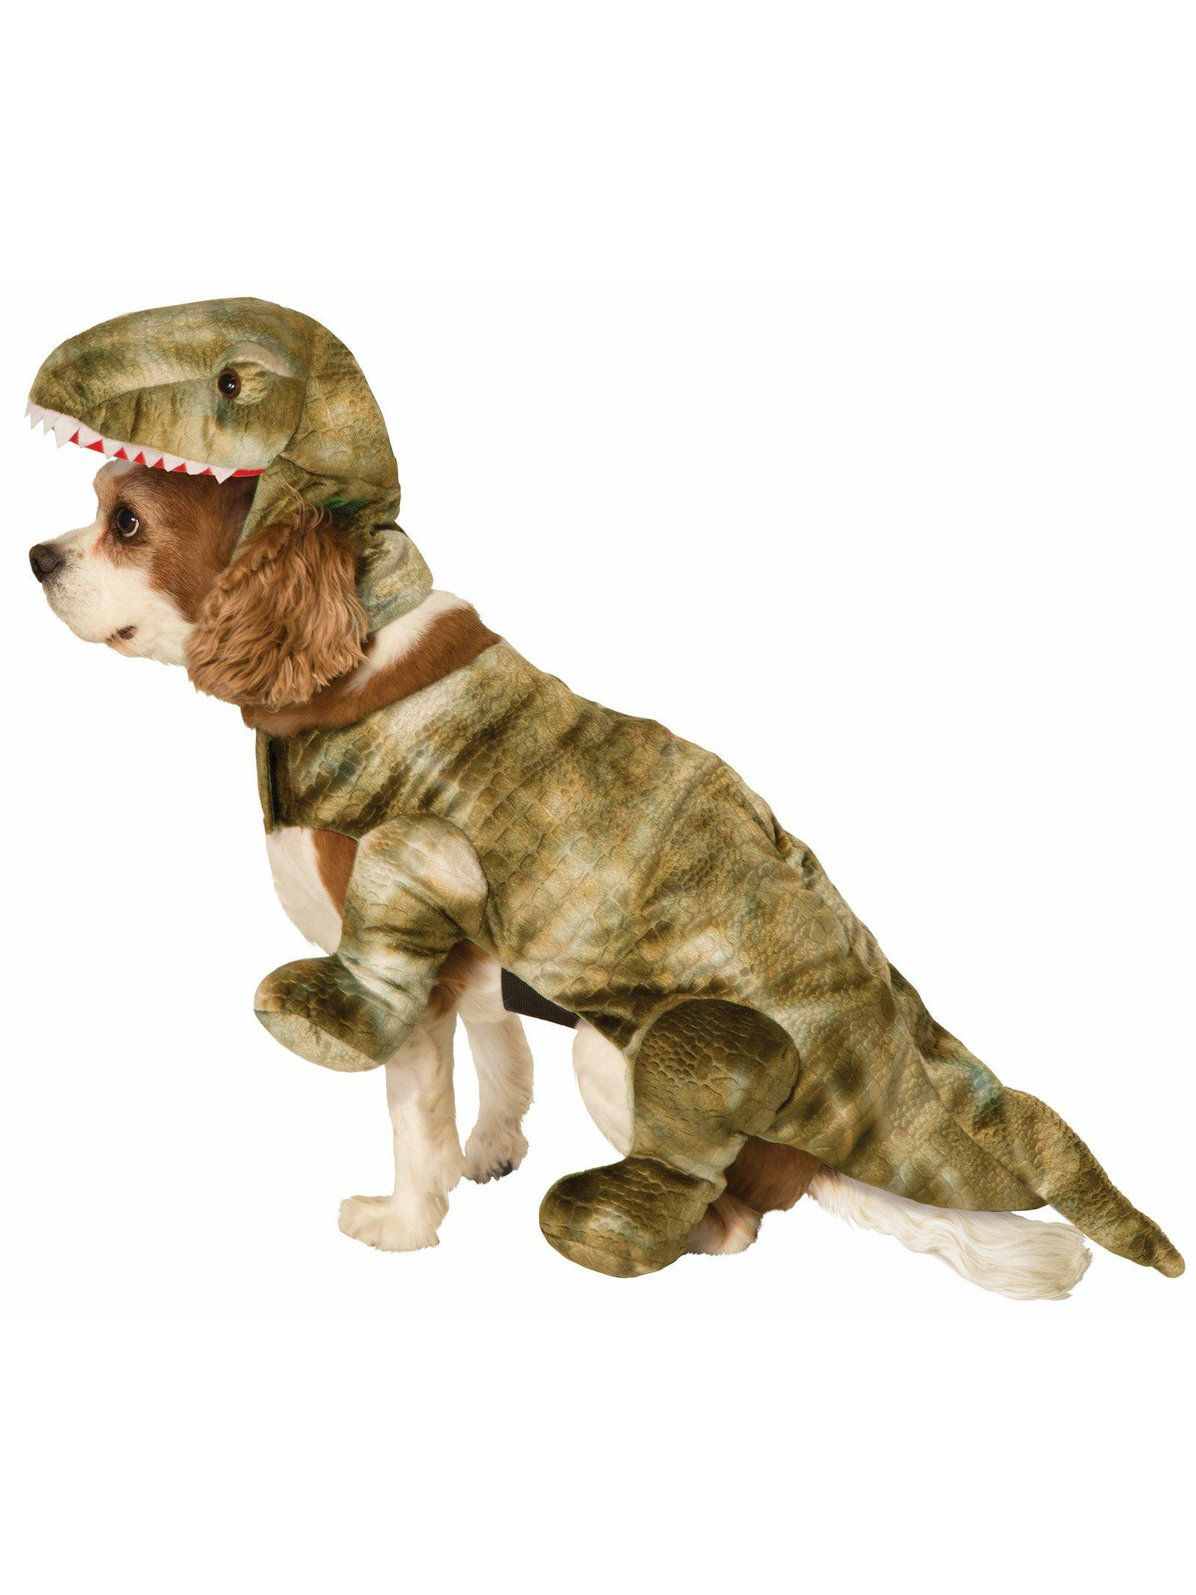 View Larger Image Trajes para mascotas, Disfraces para